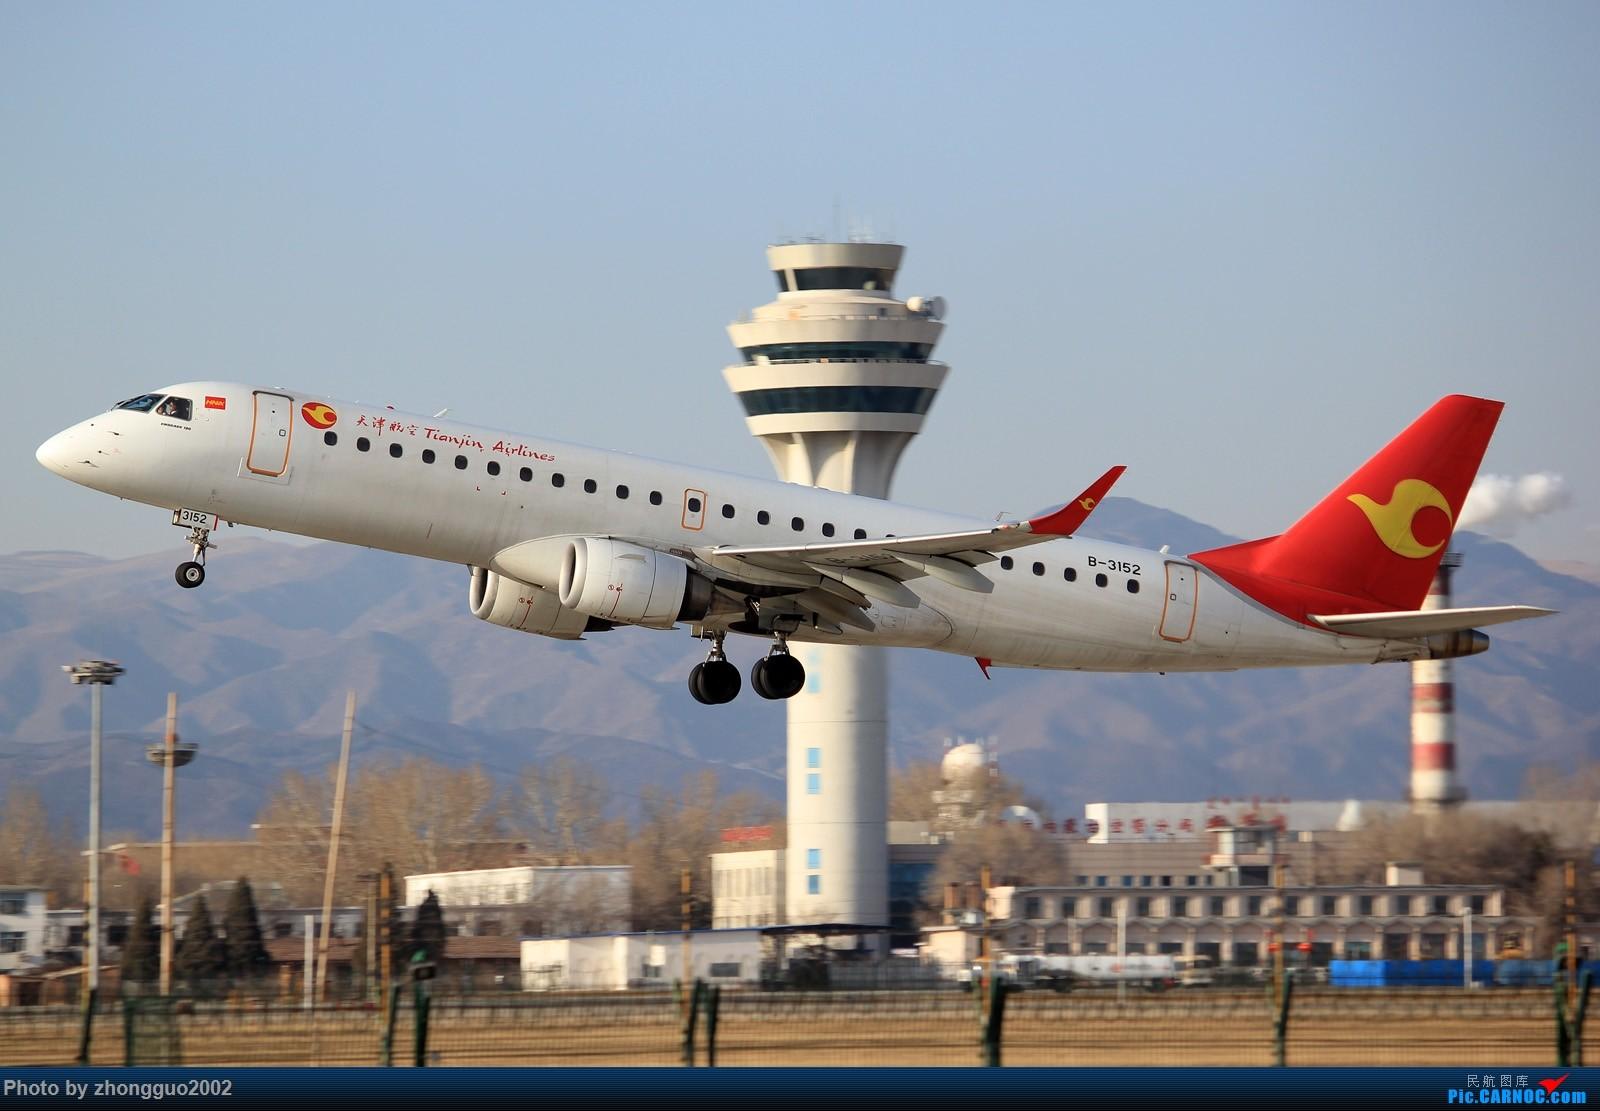 Re:[原创]久违---呼和浩特 EMBRAER E-190 B-3152 中国呼和浩特白塔国际机场